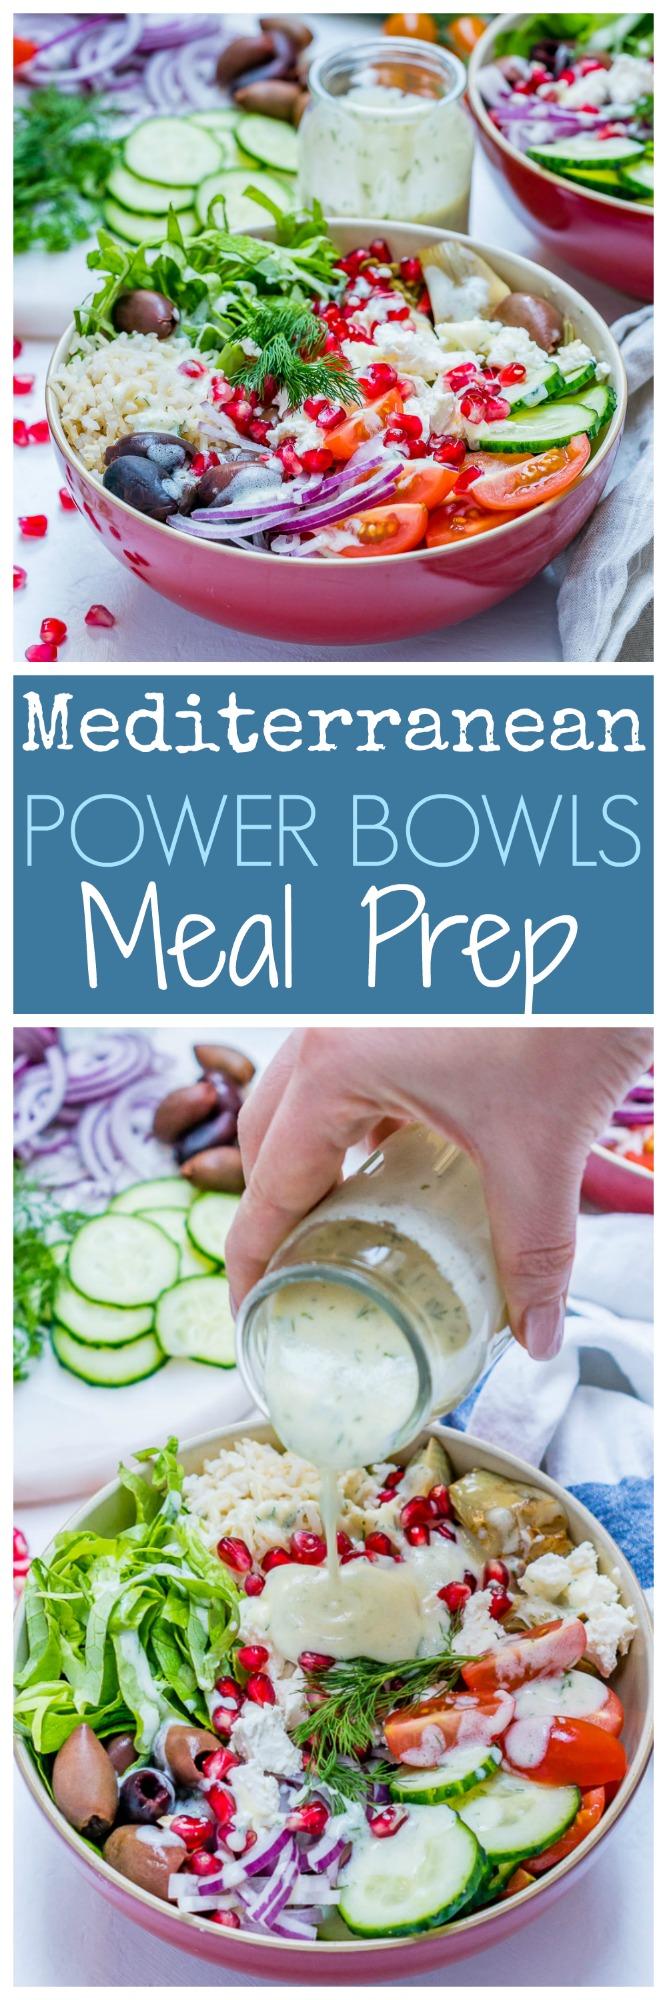 Mediterranean-Green Power Bowls Meal Prep